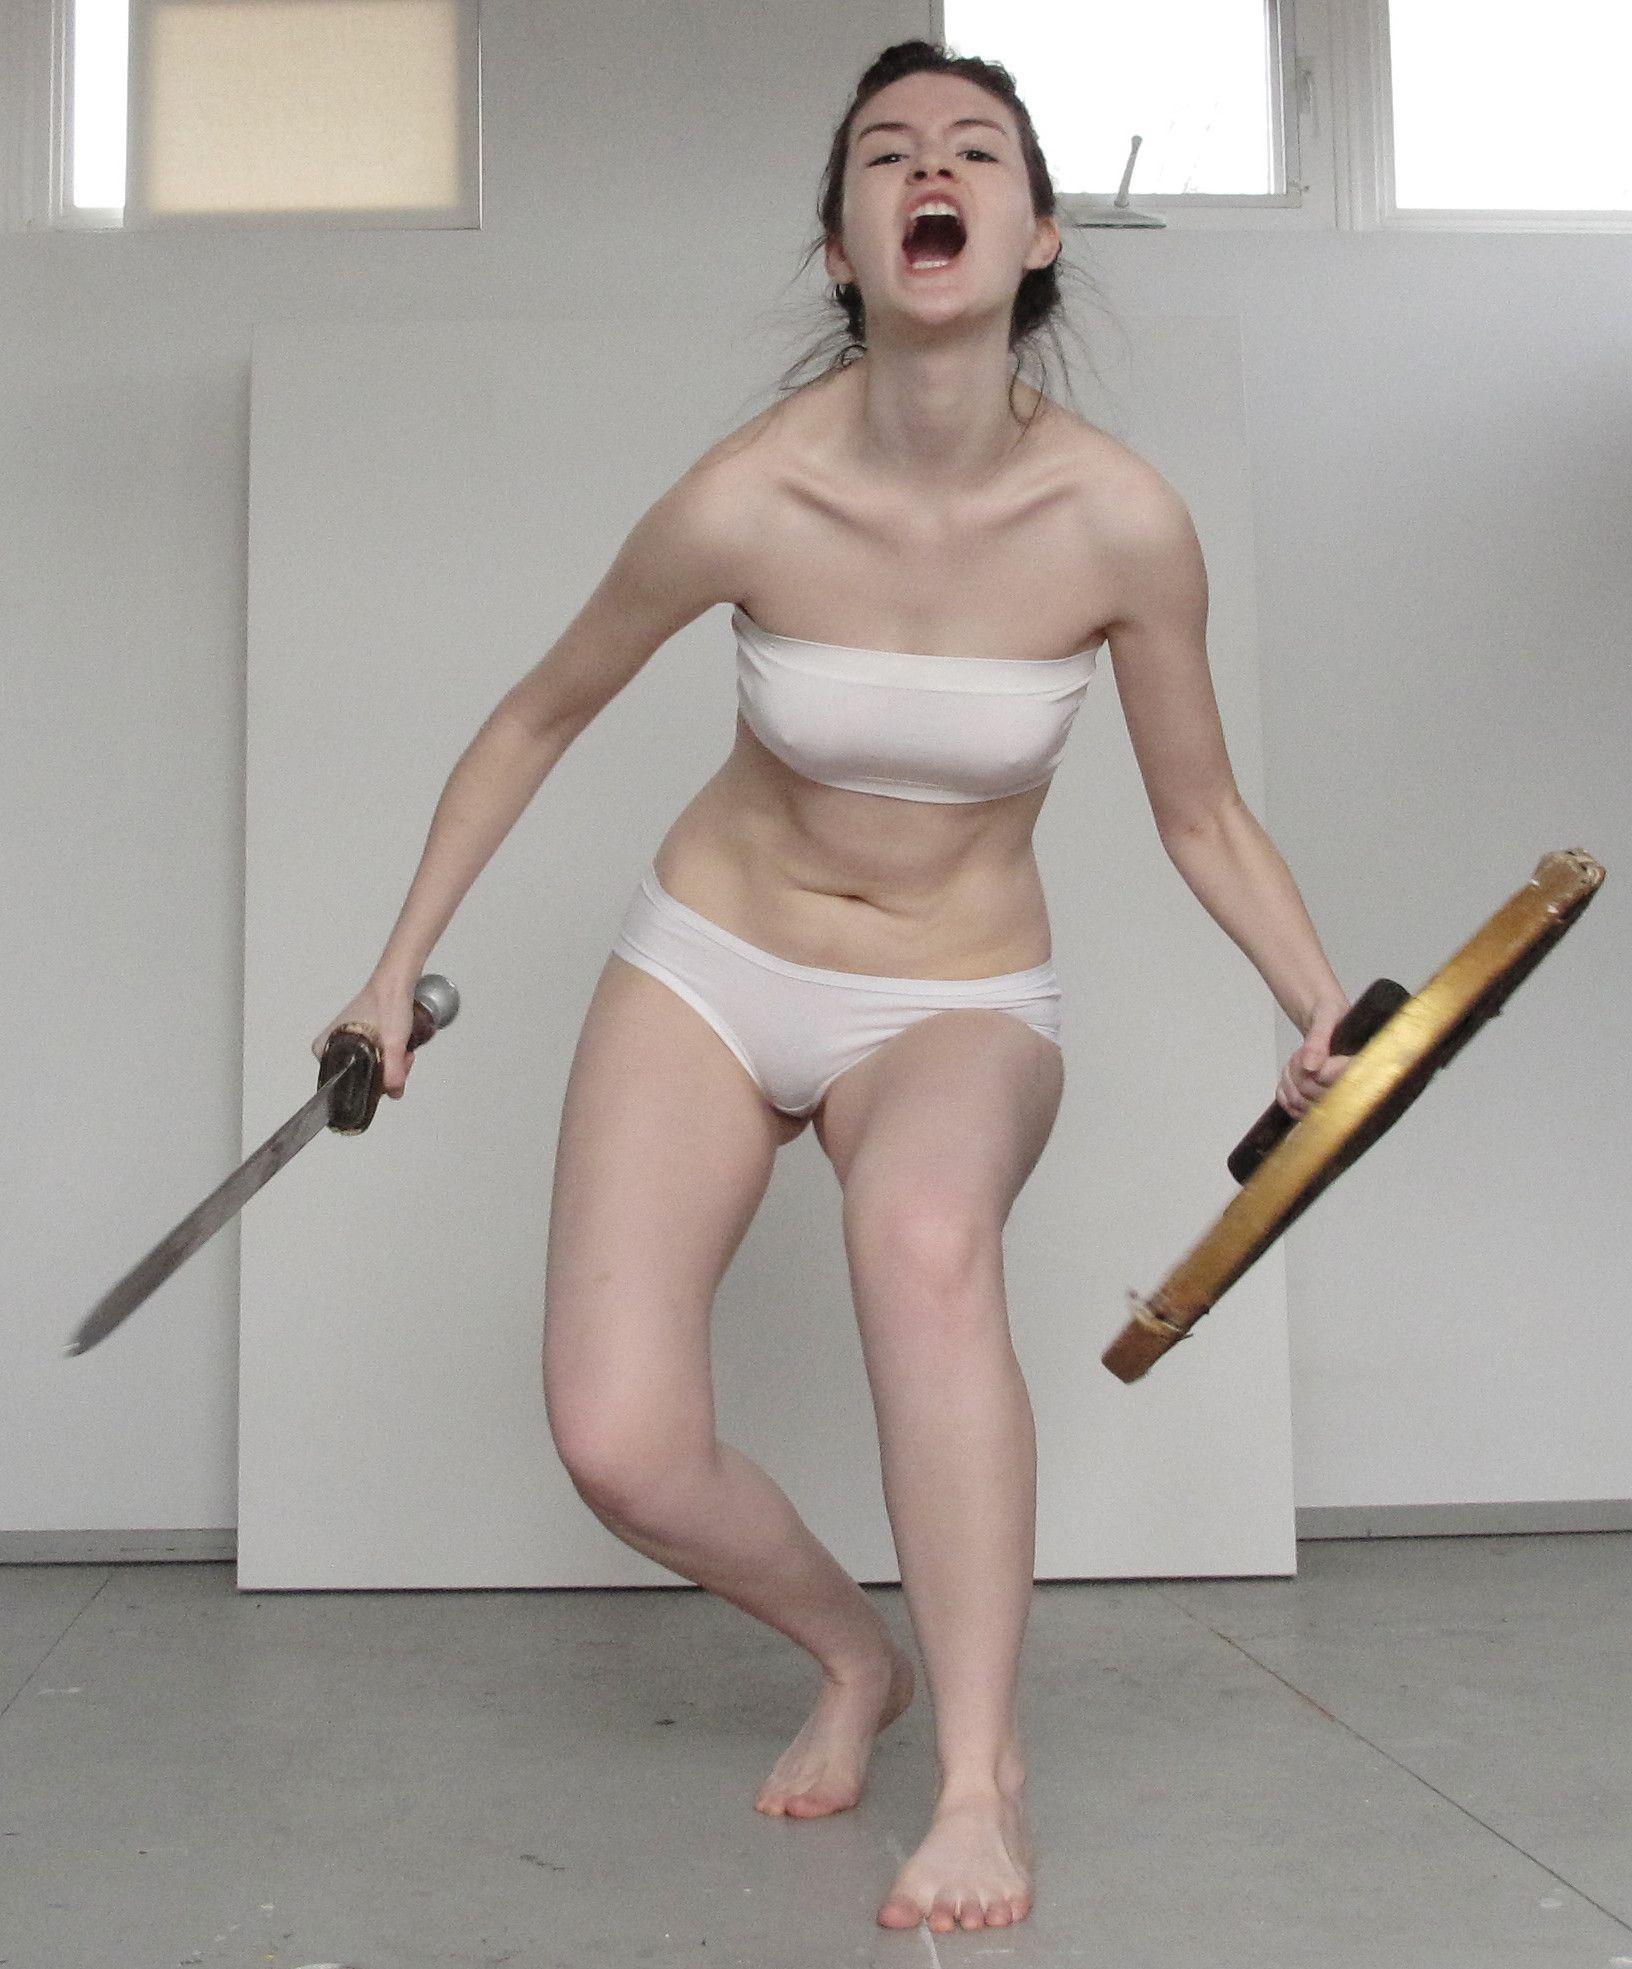 Celeb Study The Nude Female Anatomy Photos